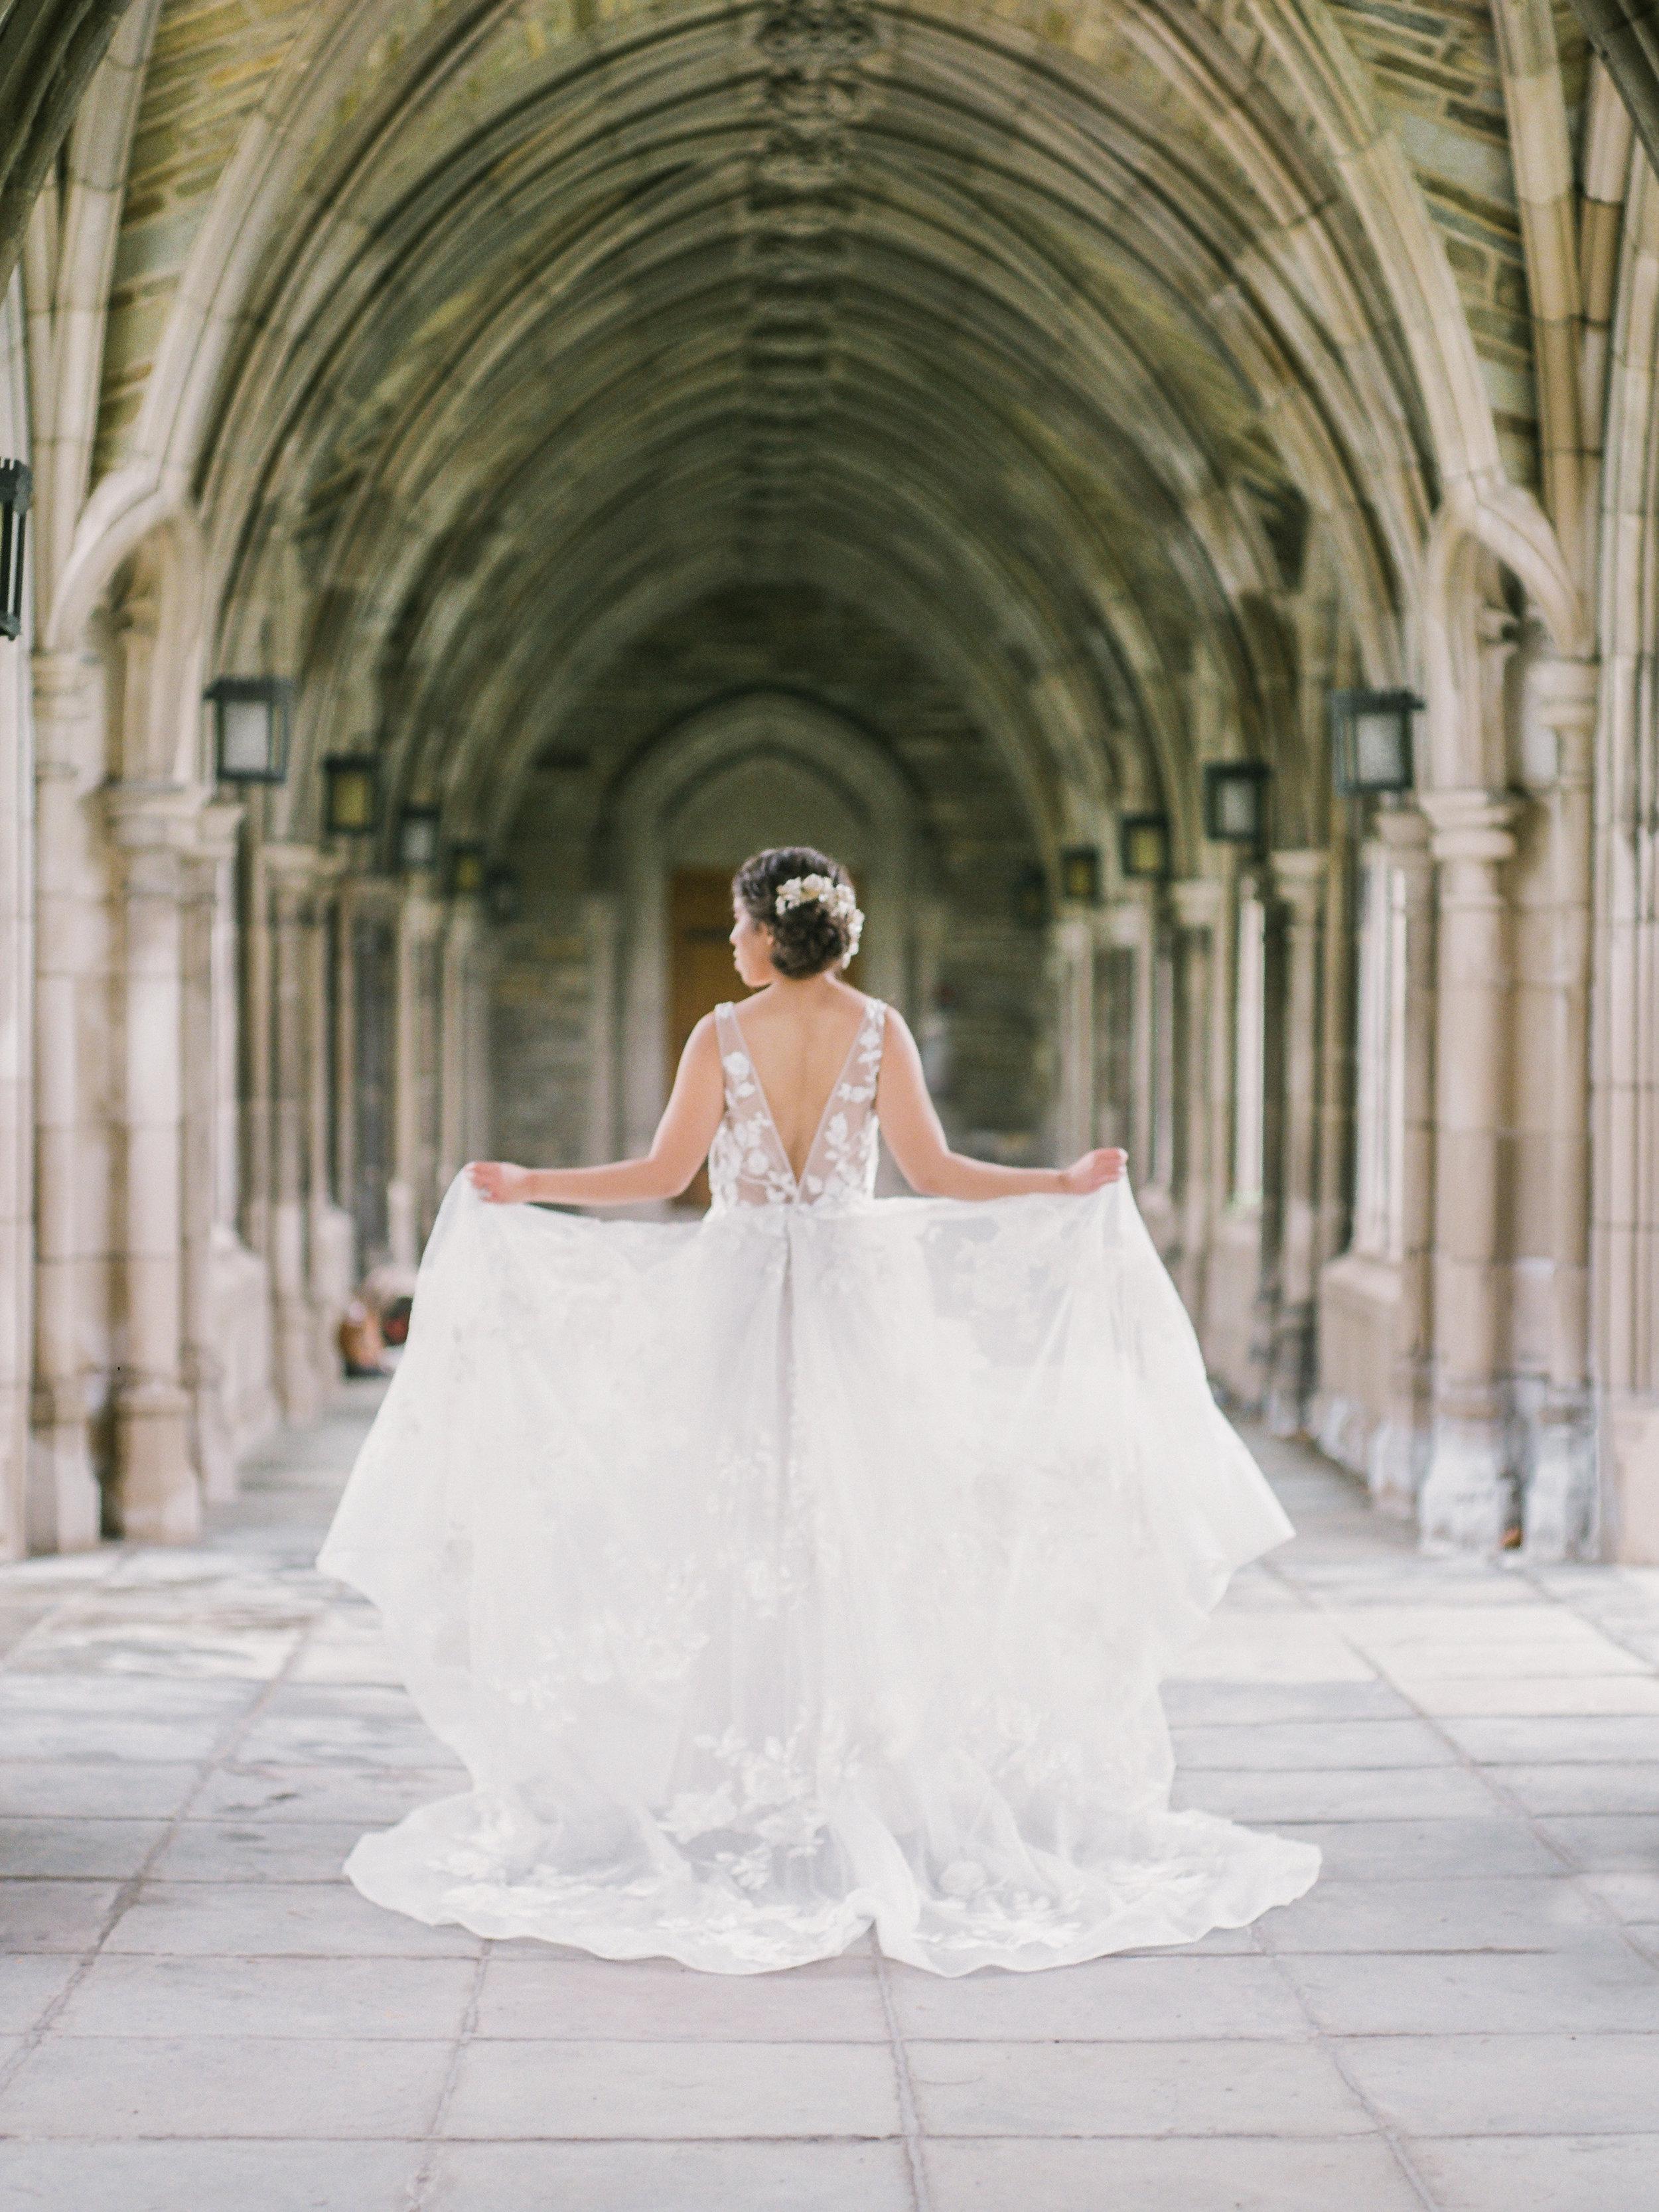 Ithaca New York-Brides Story-Manda Weaver-Wedding-1.jpg